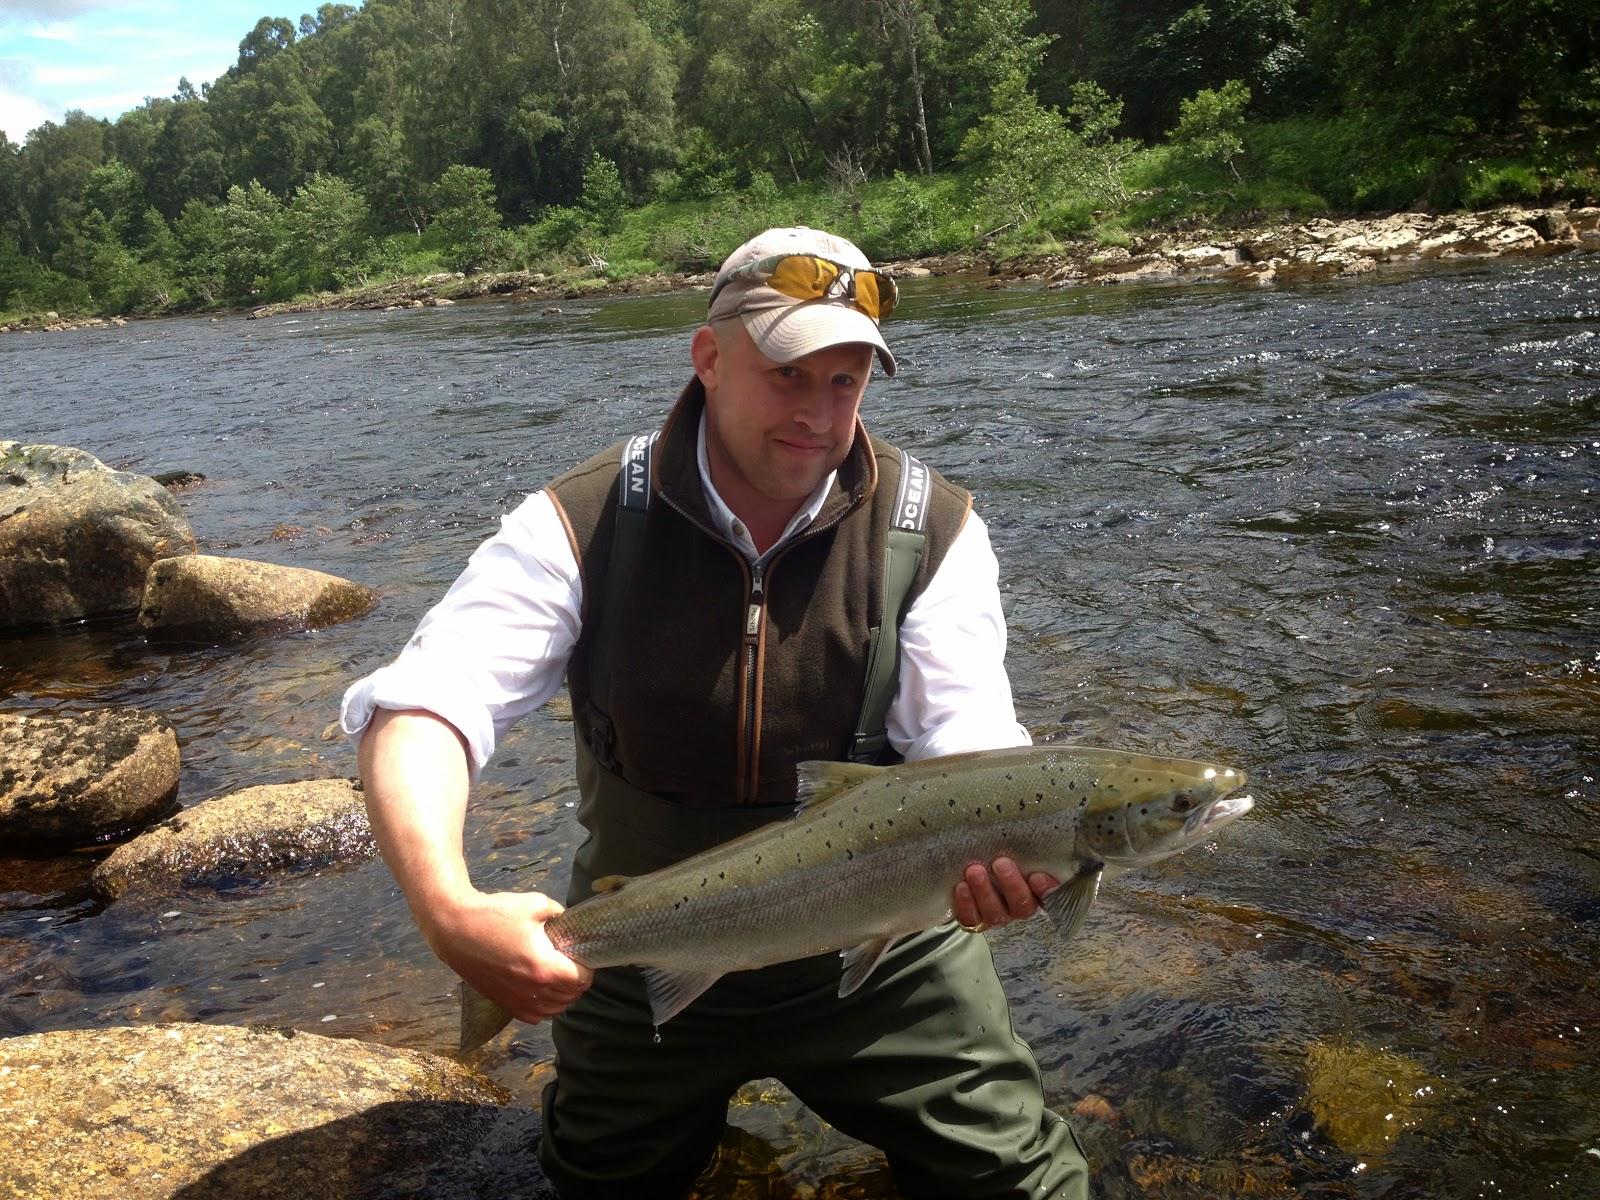 Dinnet fiordland fly fishing blog july 2014 for Fly fishing iowa